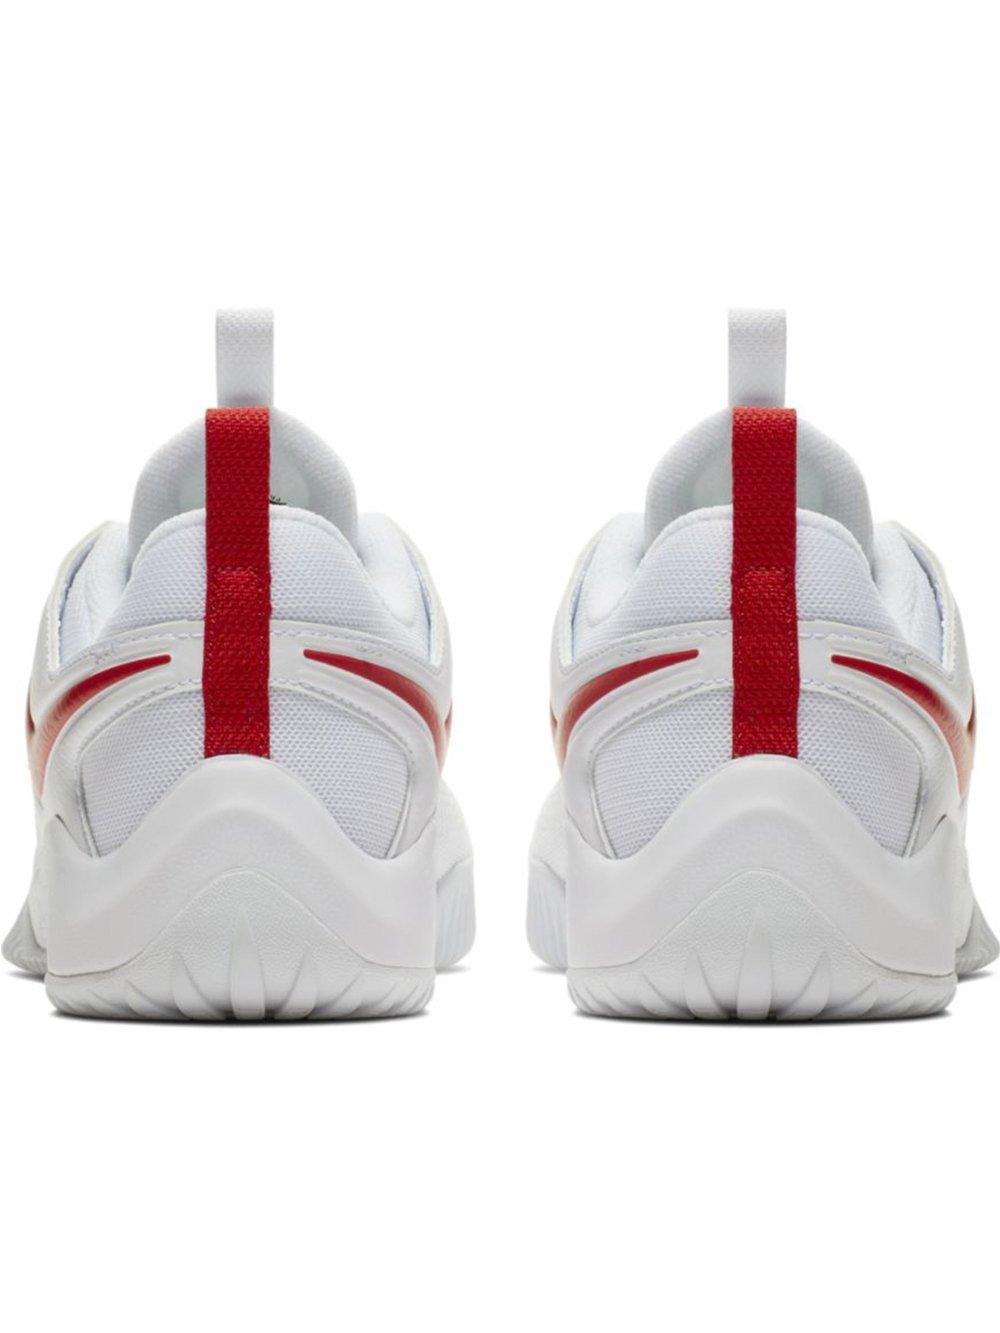 Nike Women's Zoom Hyperface 2 B(M) Volleyball Shoes B0761YY16W 8.5 B(M) 2 US White/University Red 46c030